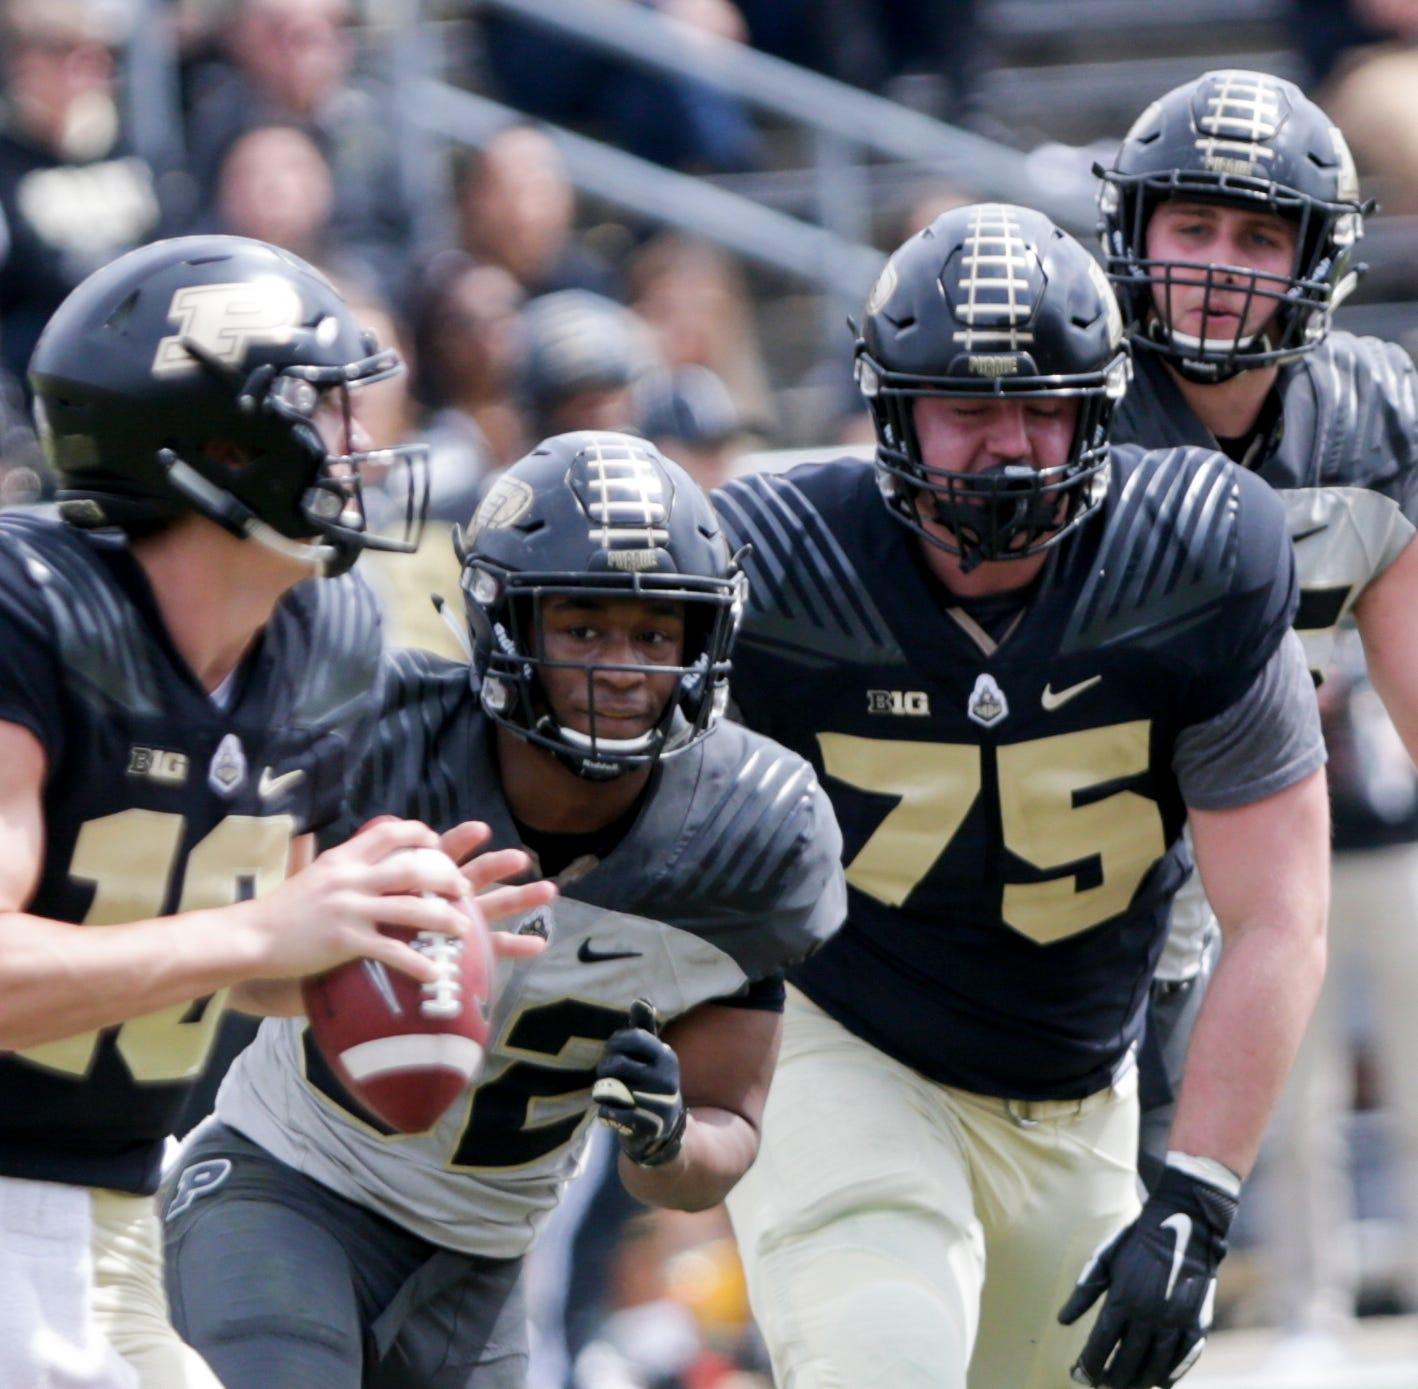 Elijah Ball's versatility gives Purdue defense options